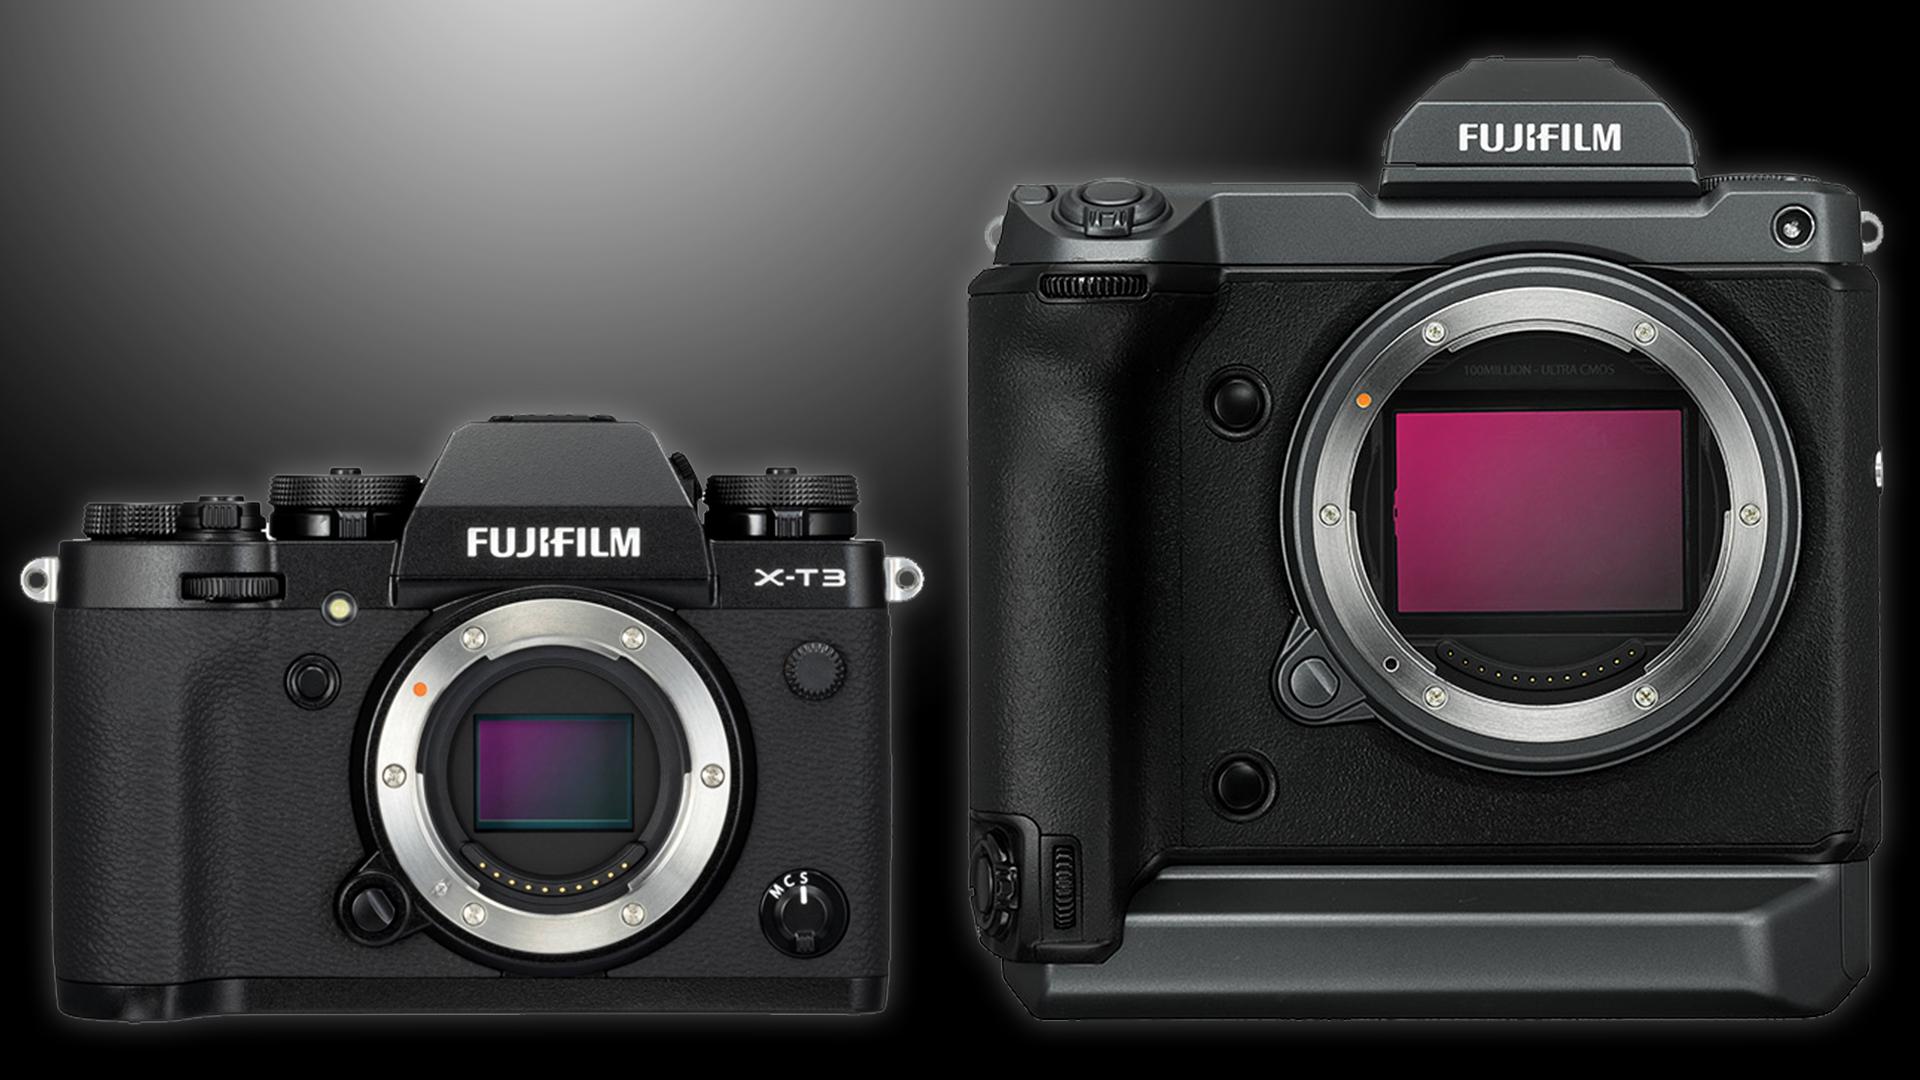 FUJIFILM X Summit: GFX Medium Format Camera Presented, New X